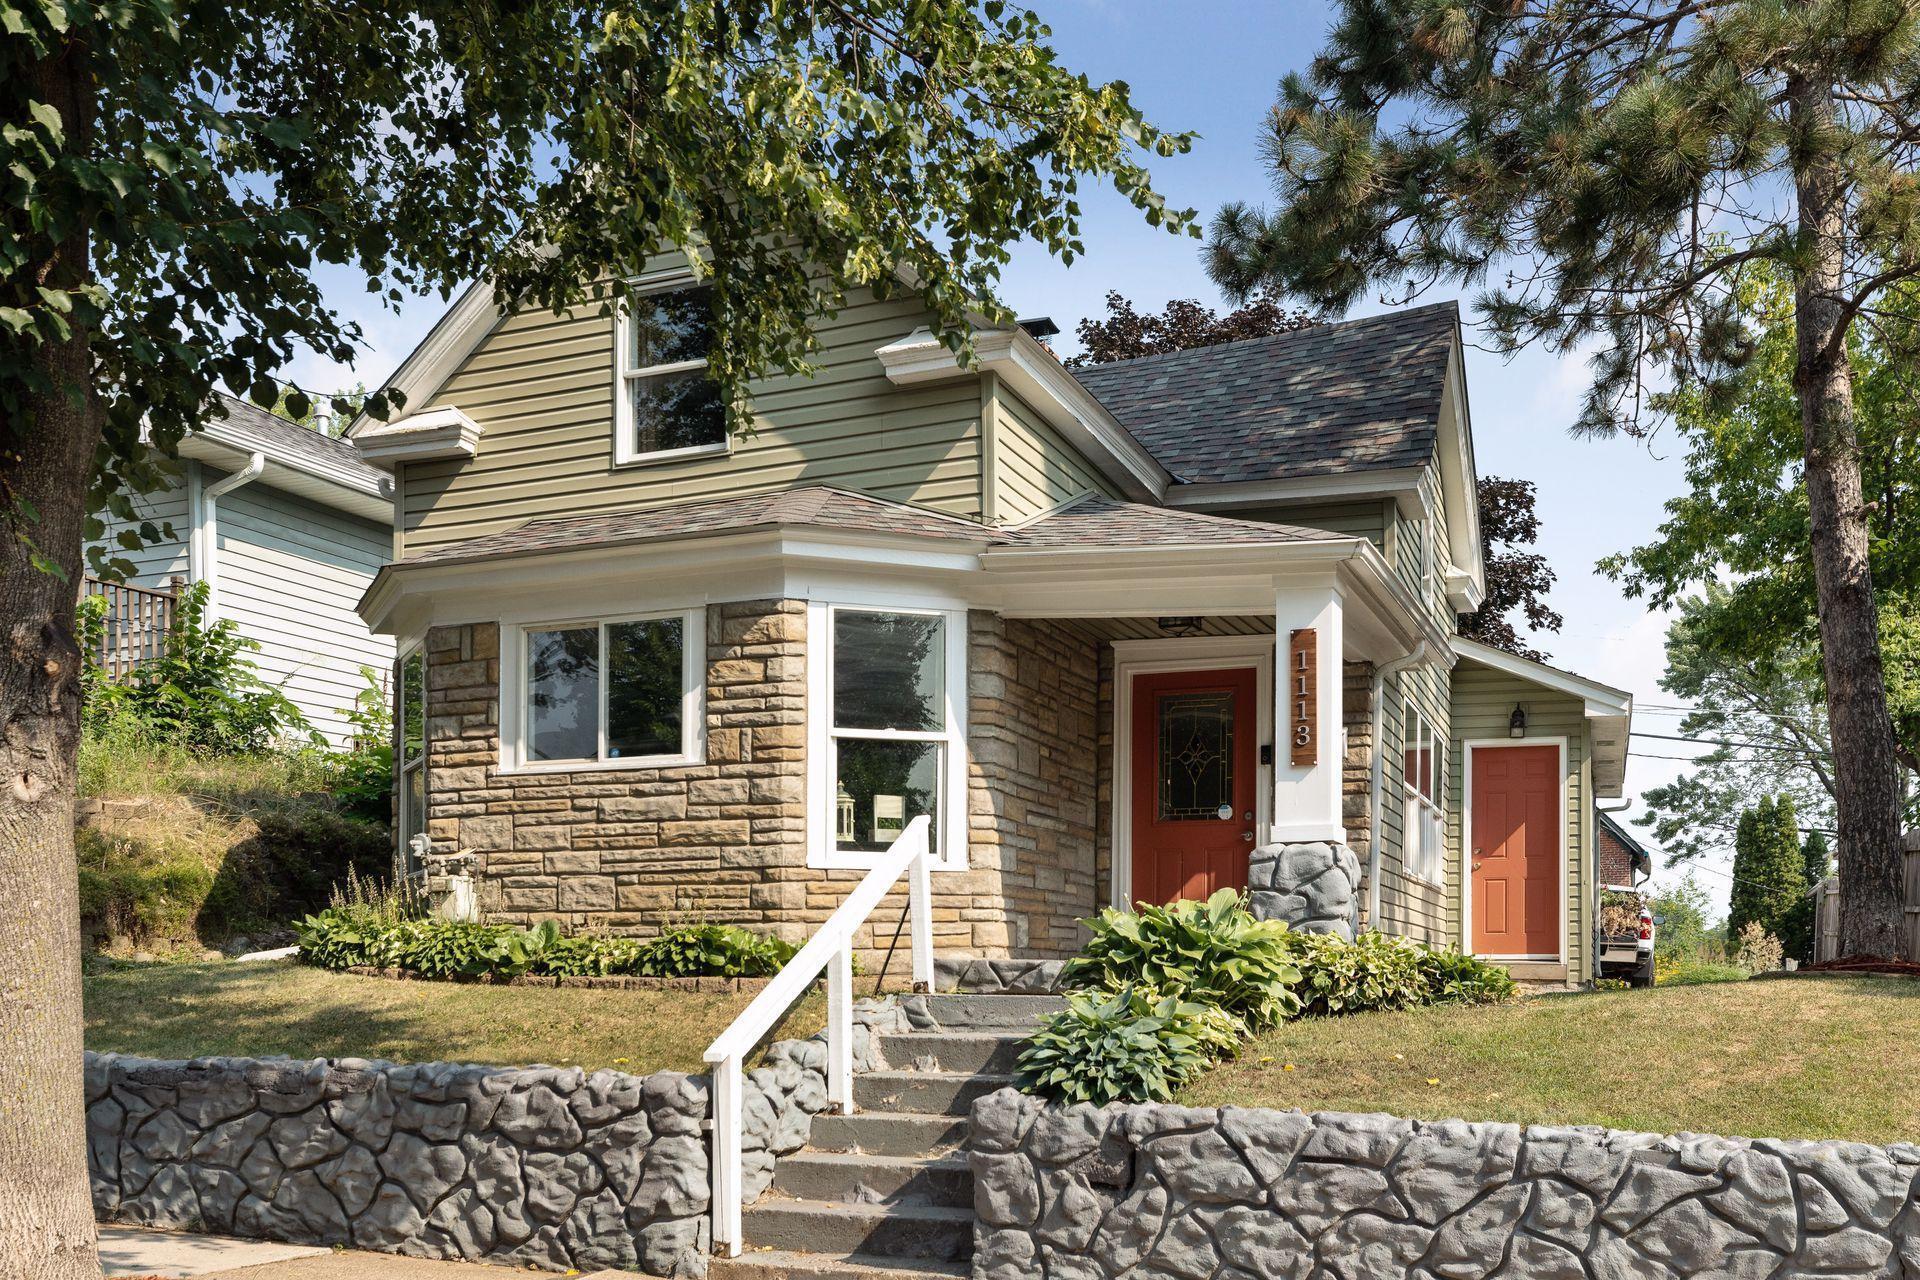 Charming 4 bedrooms, 2 bathrooms bungalow in the Dayton's Bluff neighborhood!